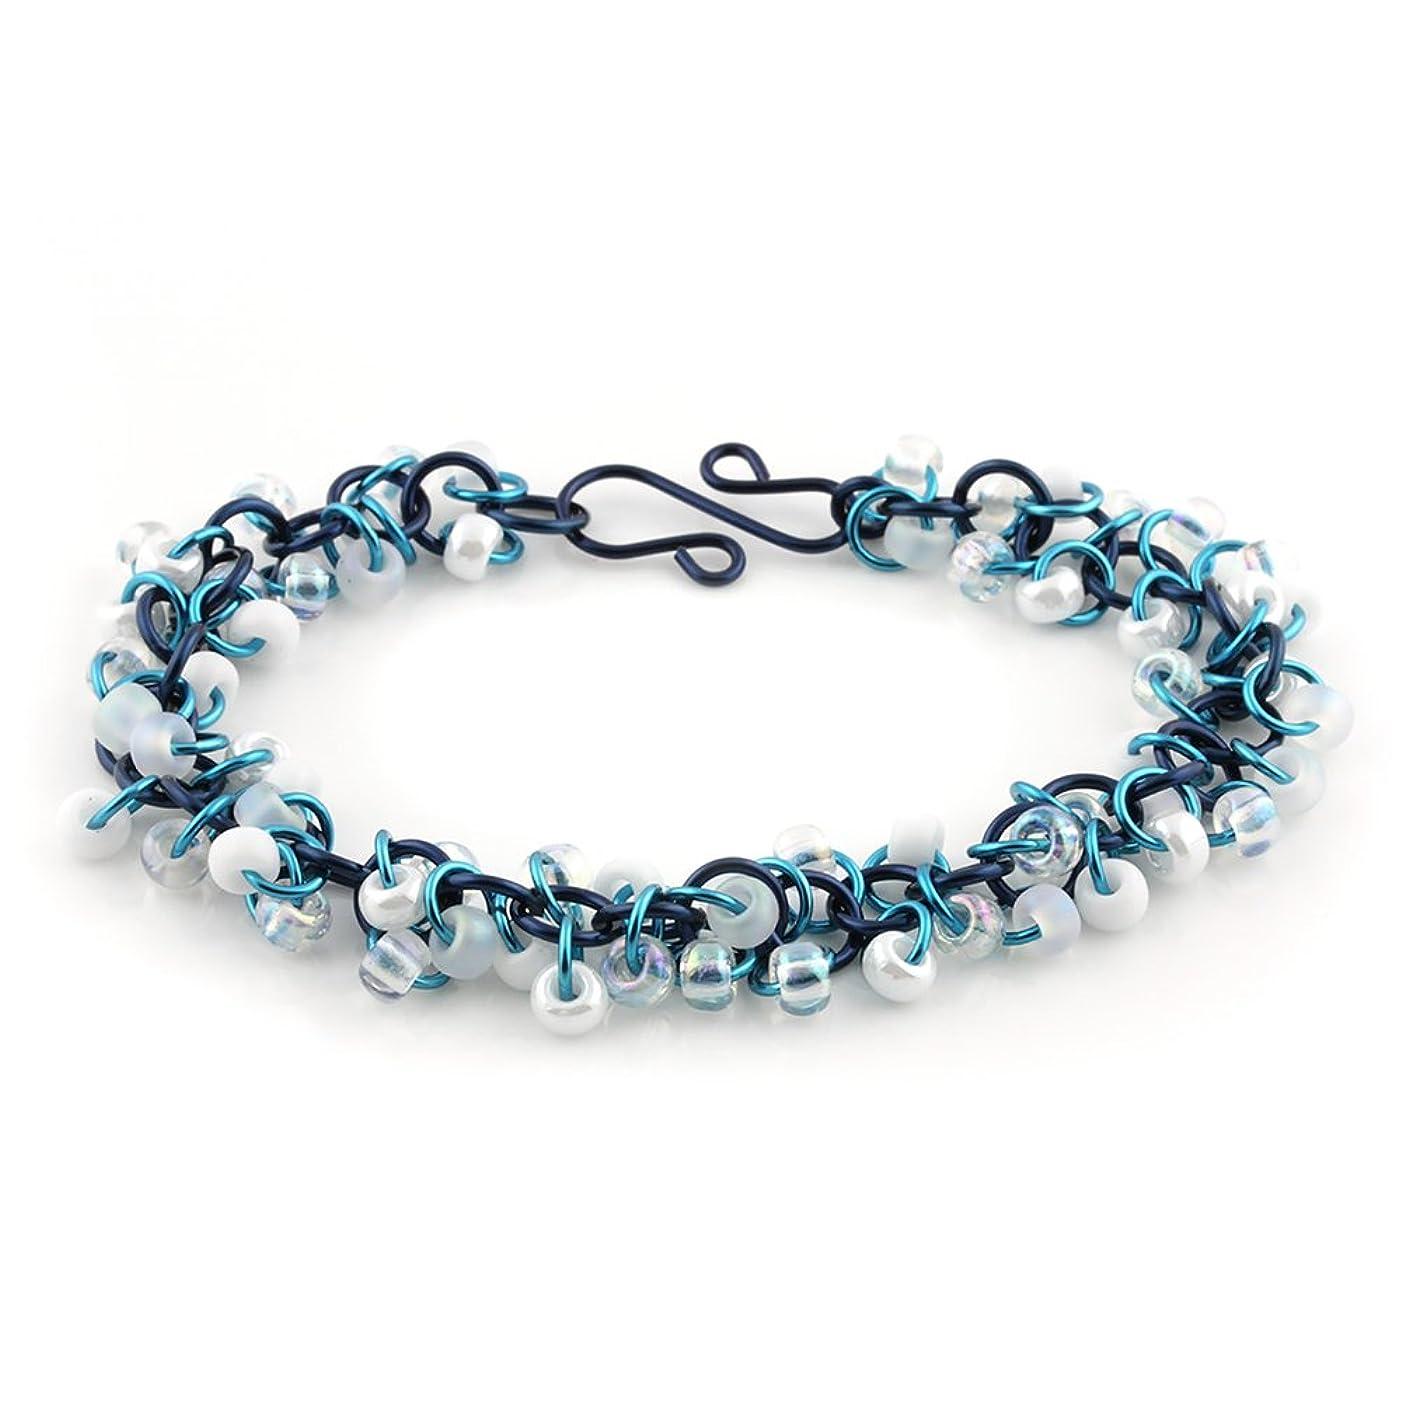 Weave Got Maille Blue Mist Shaggy Loops Chain Maille Bracelet Kit